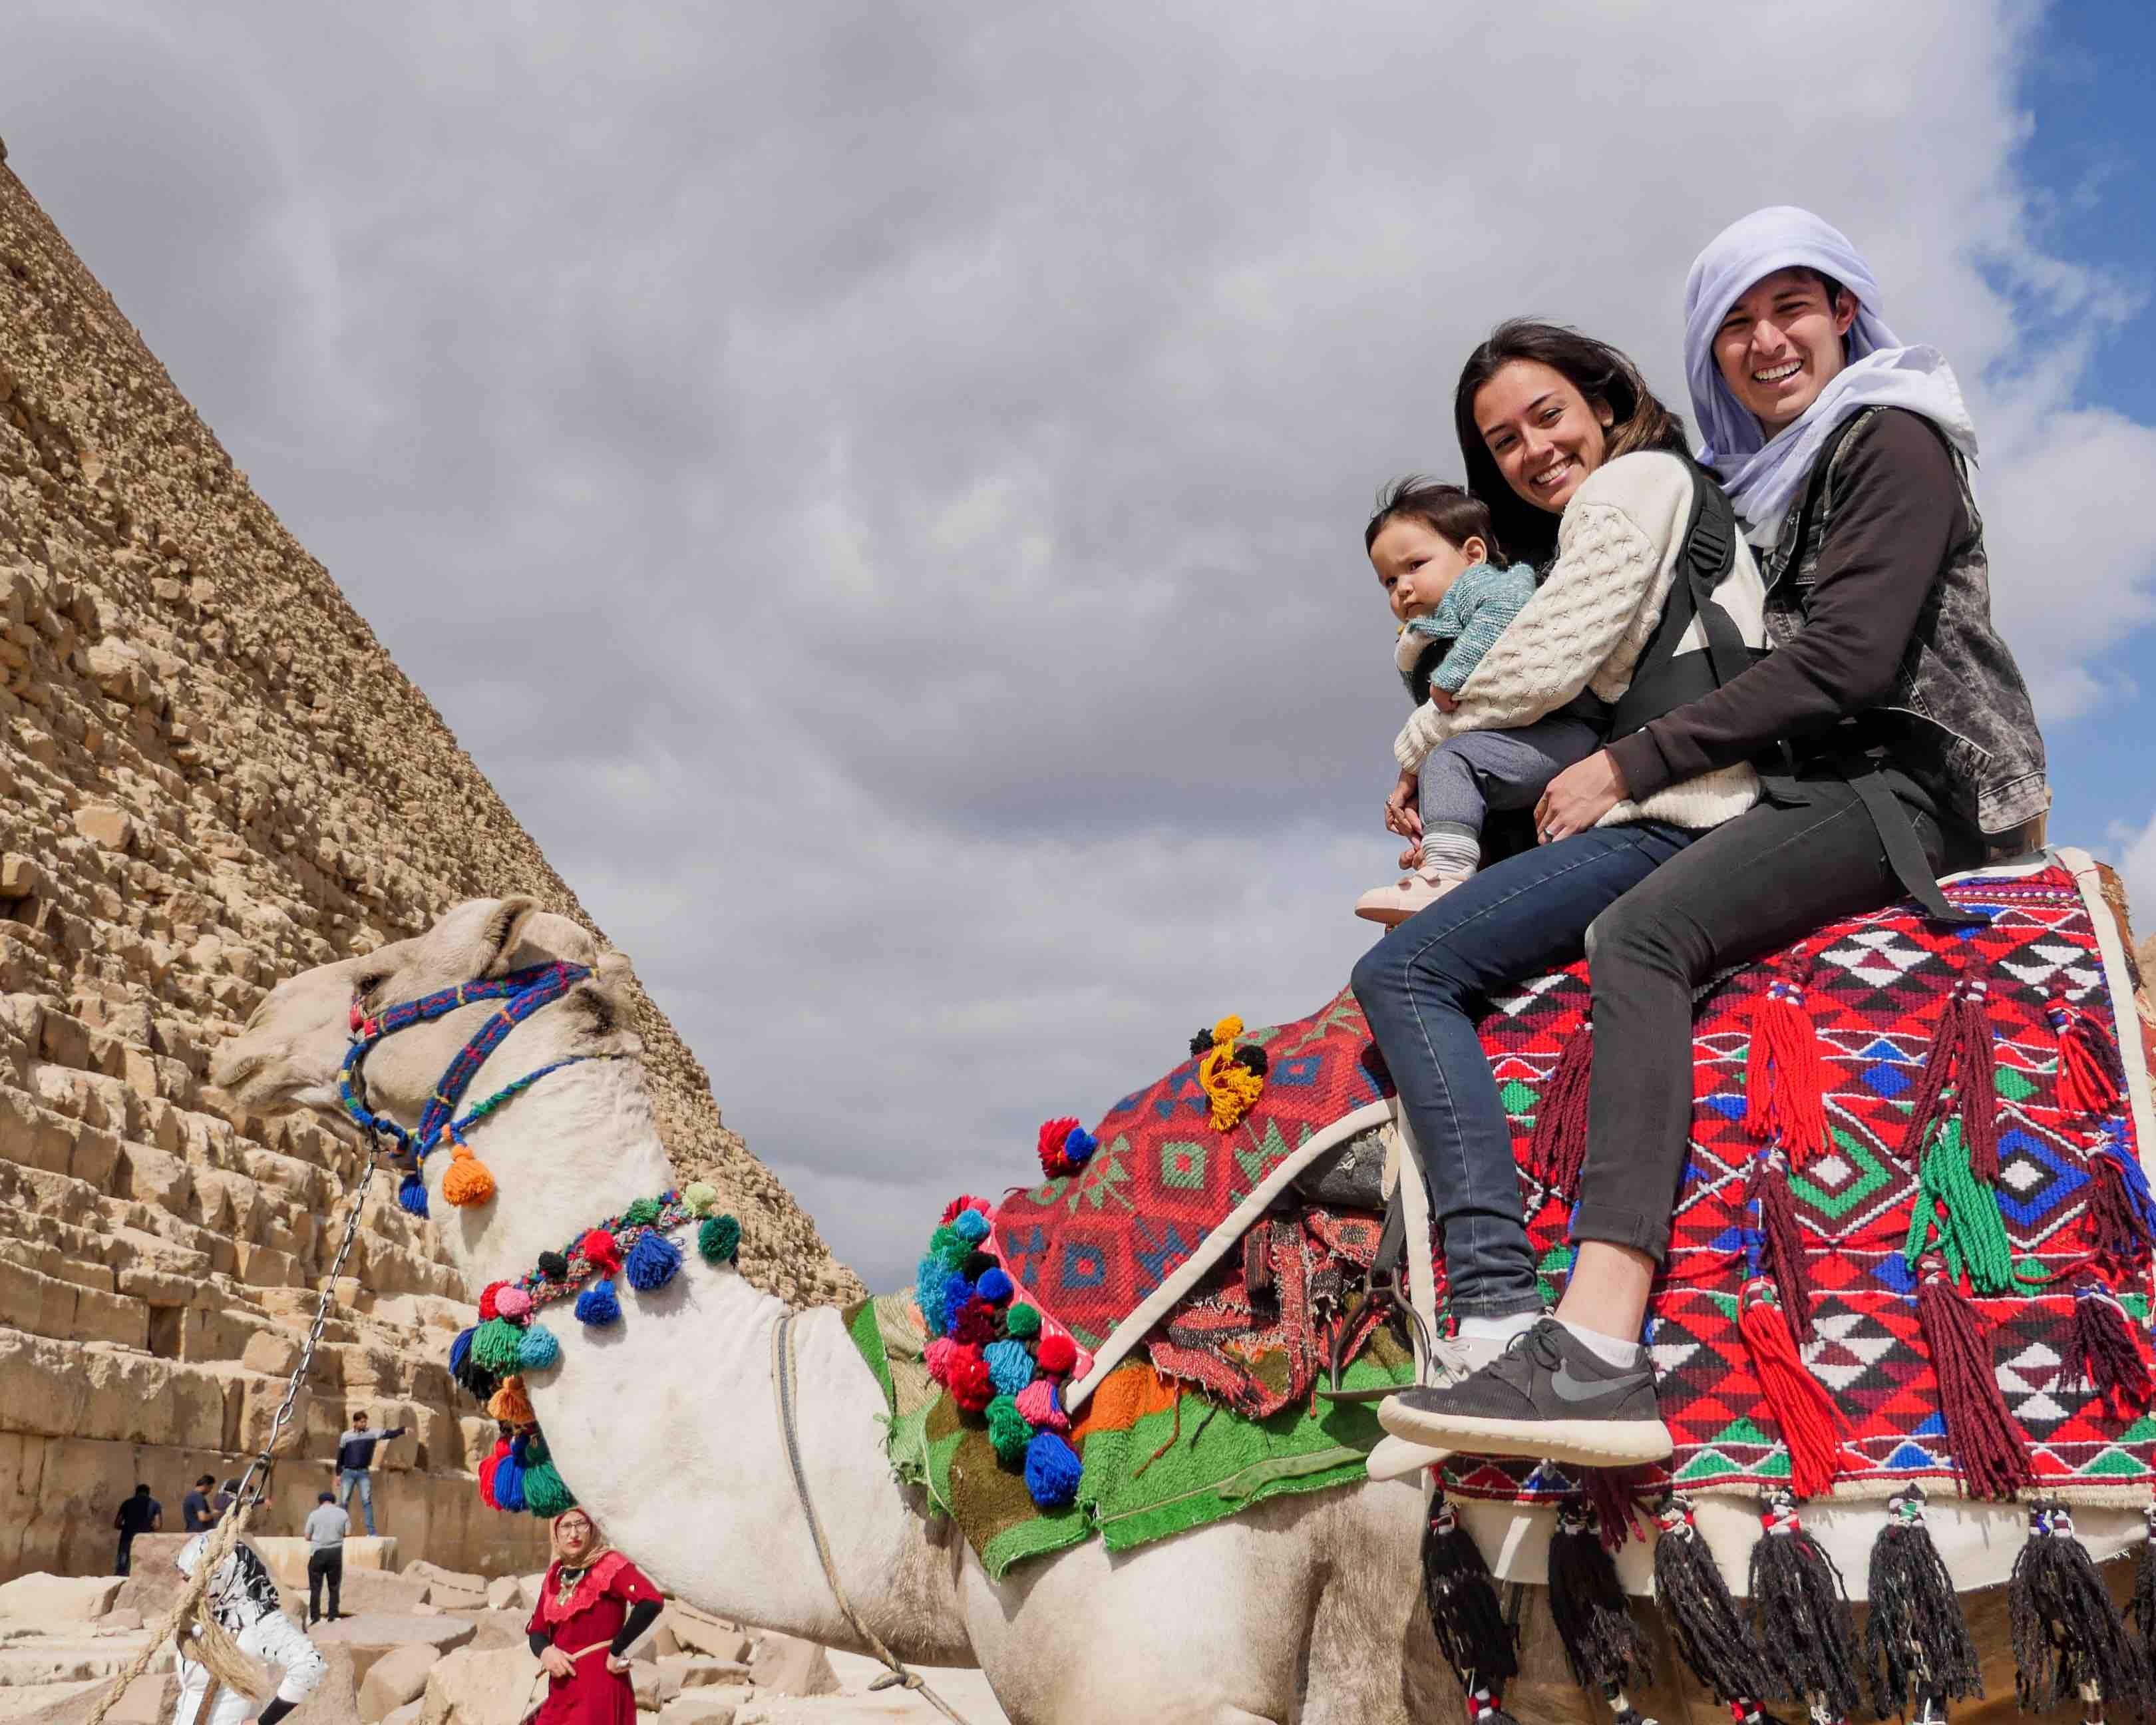 Outreach-Camel-Family-Smile-Pyramid